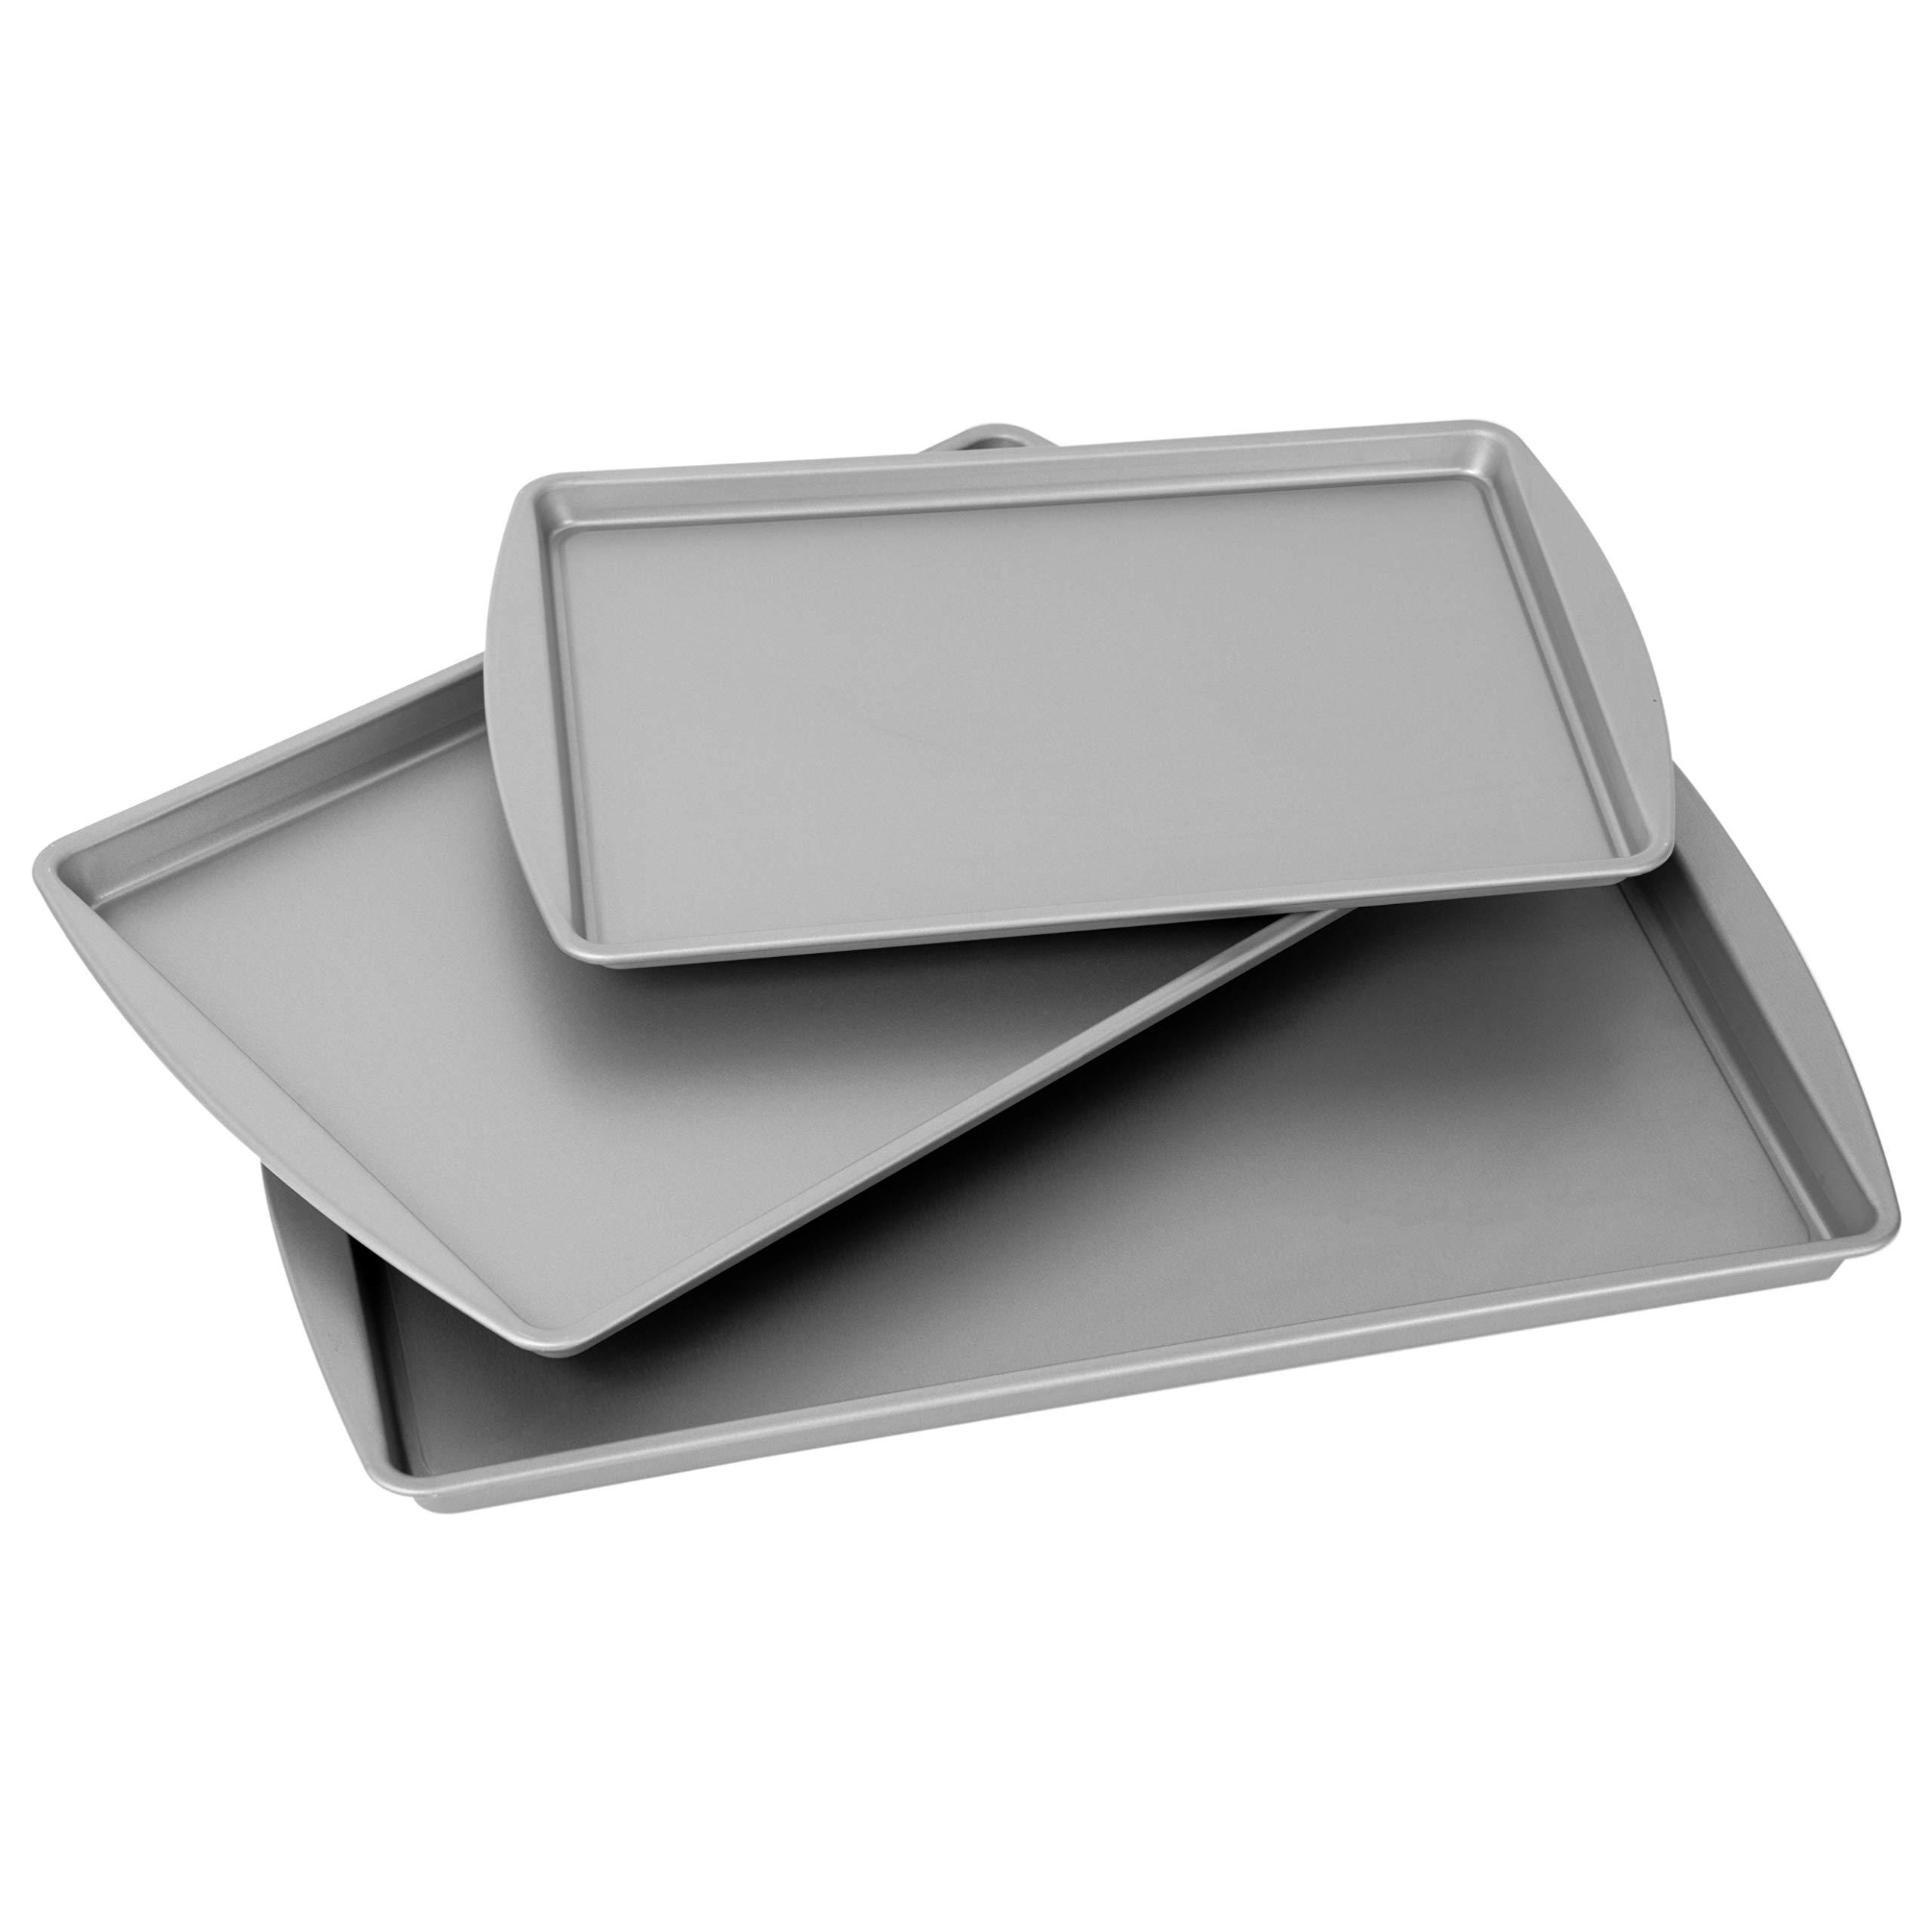 Graphite 25901 Kuhn Rikon Silicone Toaster Oven Sheet